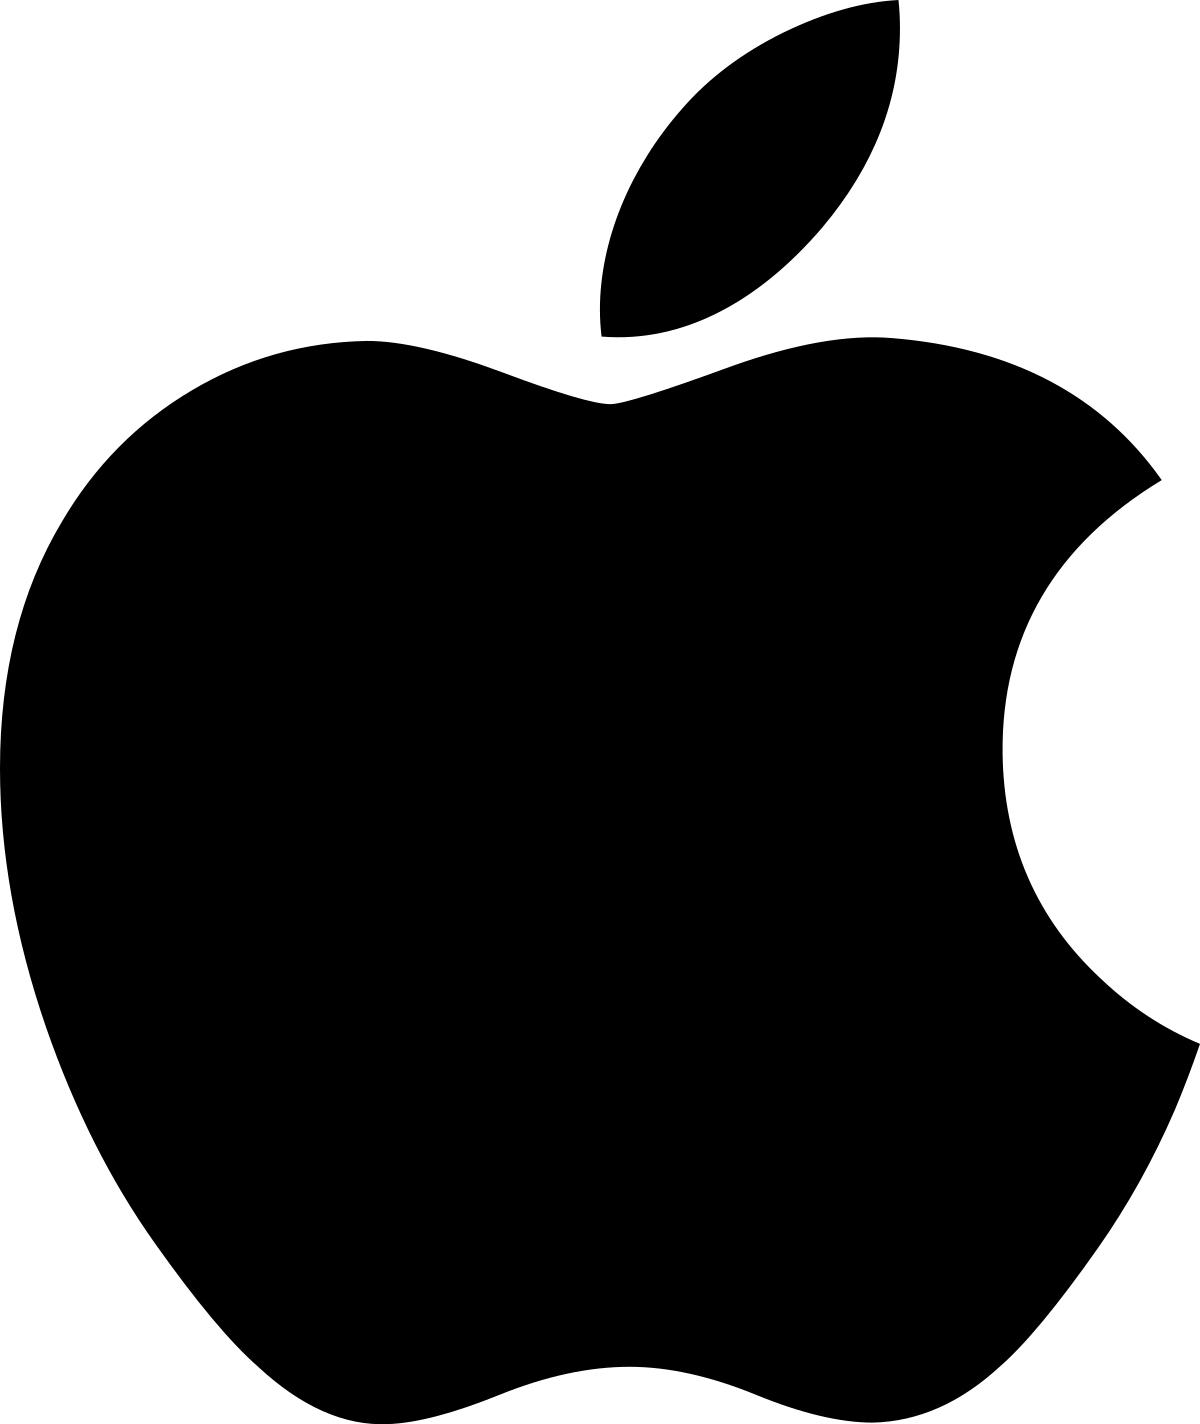 SAV apple